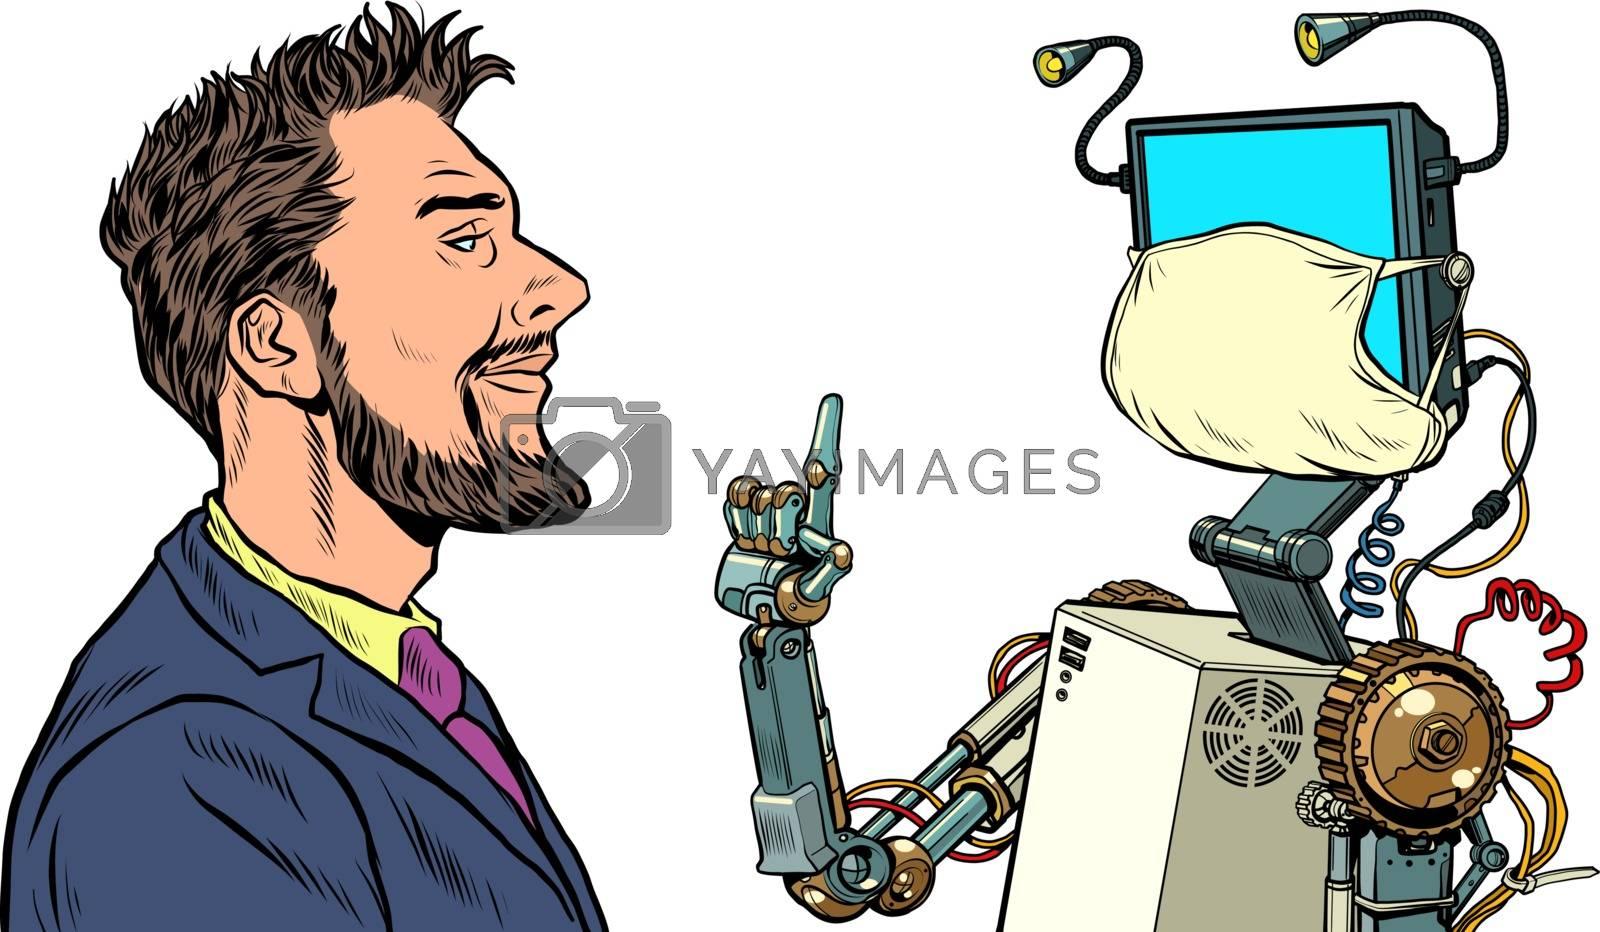 The robot teacher. Distance education during the epidemic. Pop art retro vector illustration vintage kitsch 50s 60s style